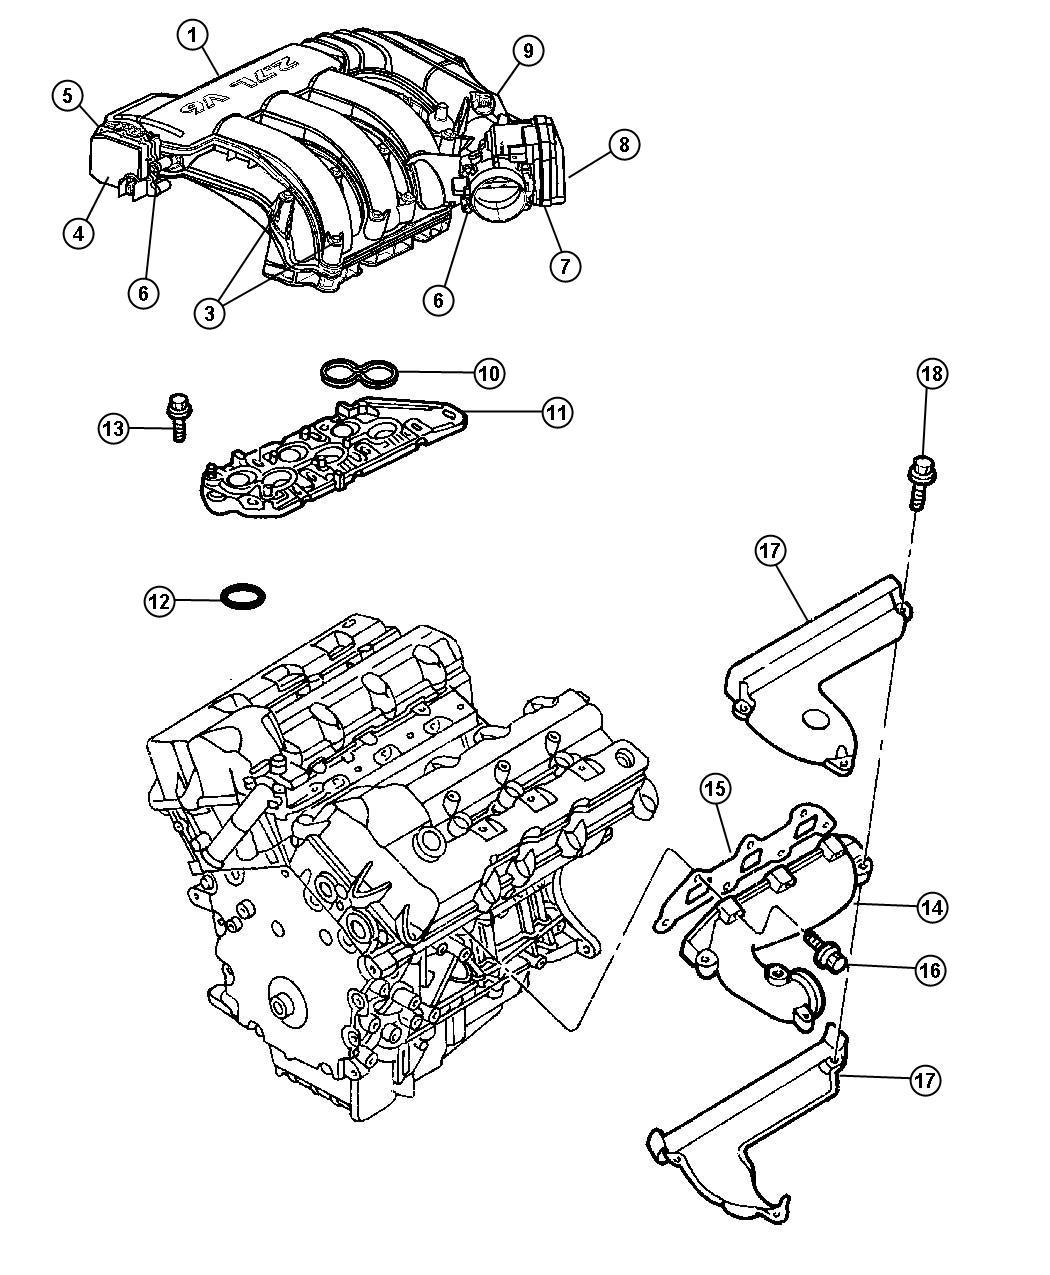 2007 Dodge Magnum Pad. Engine. Foam. Eer, intake, manifold